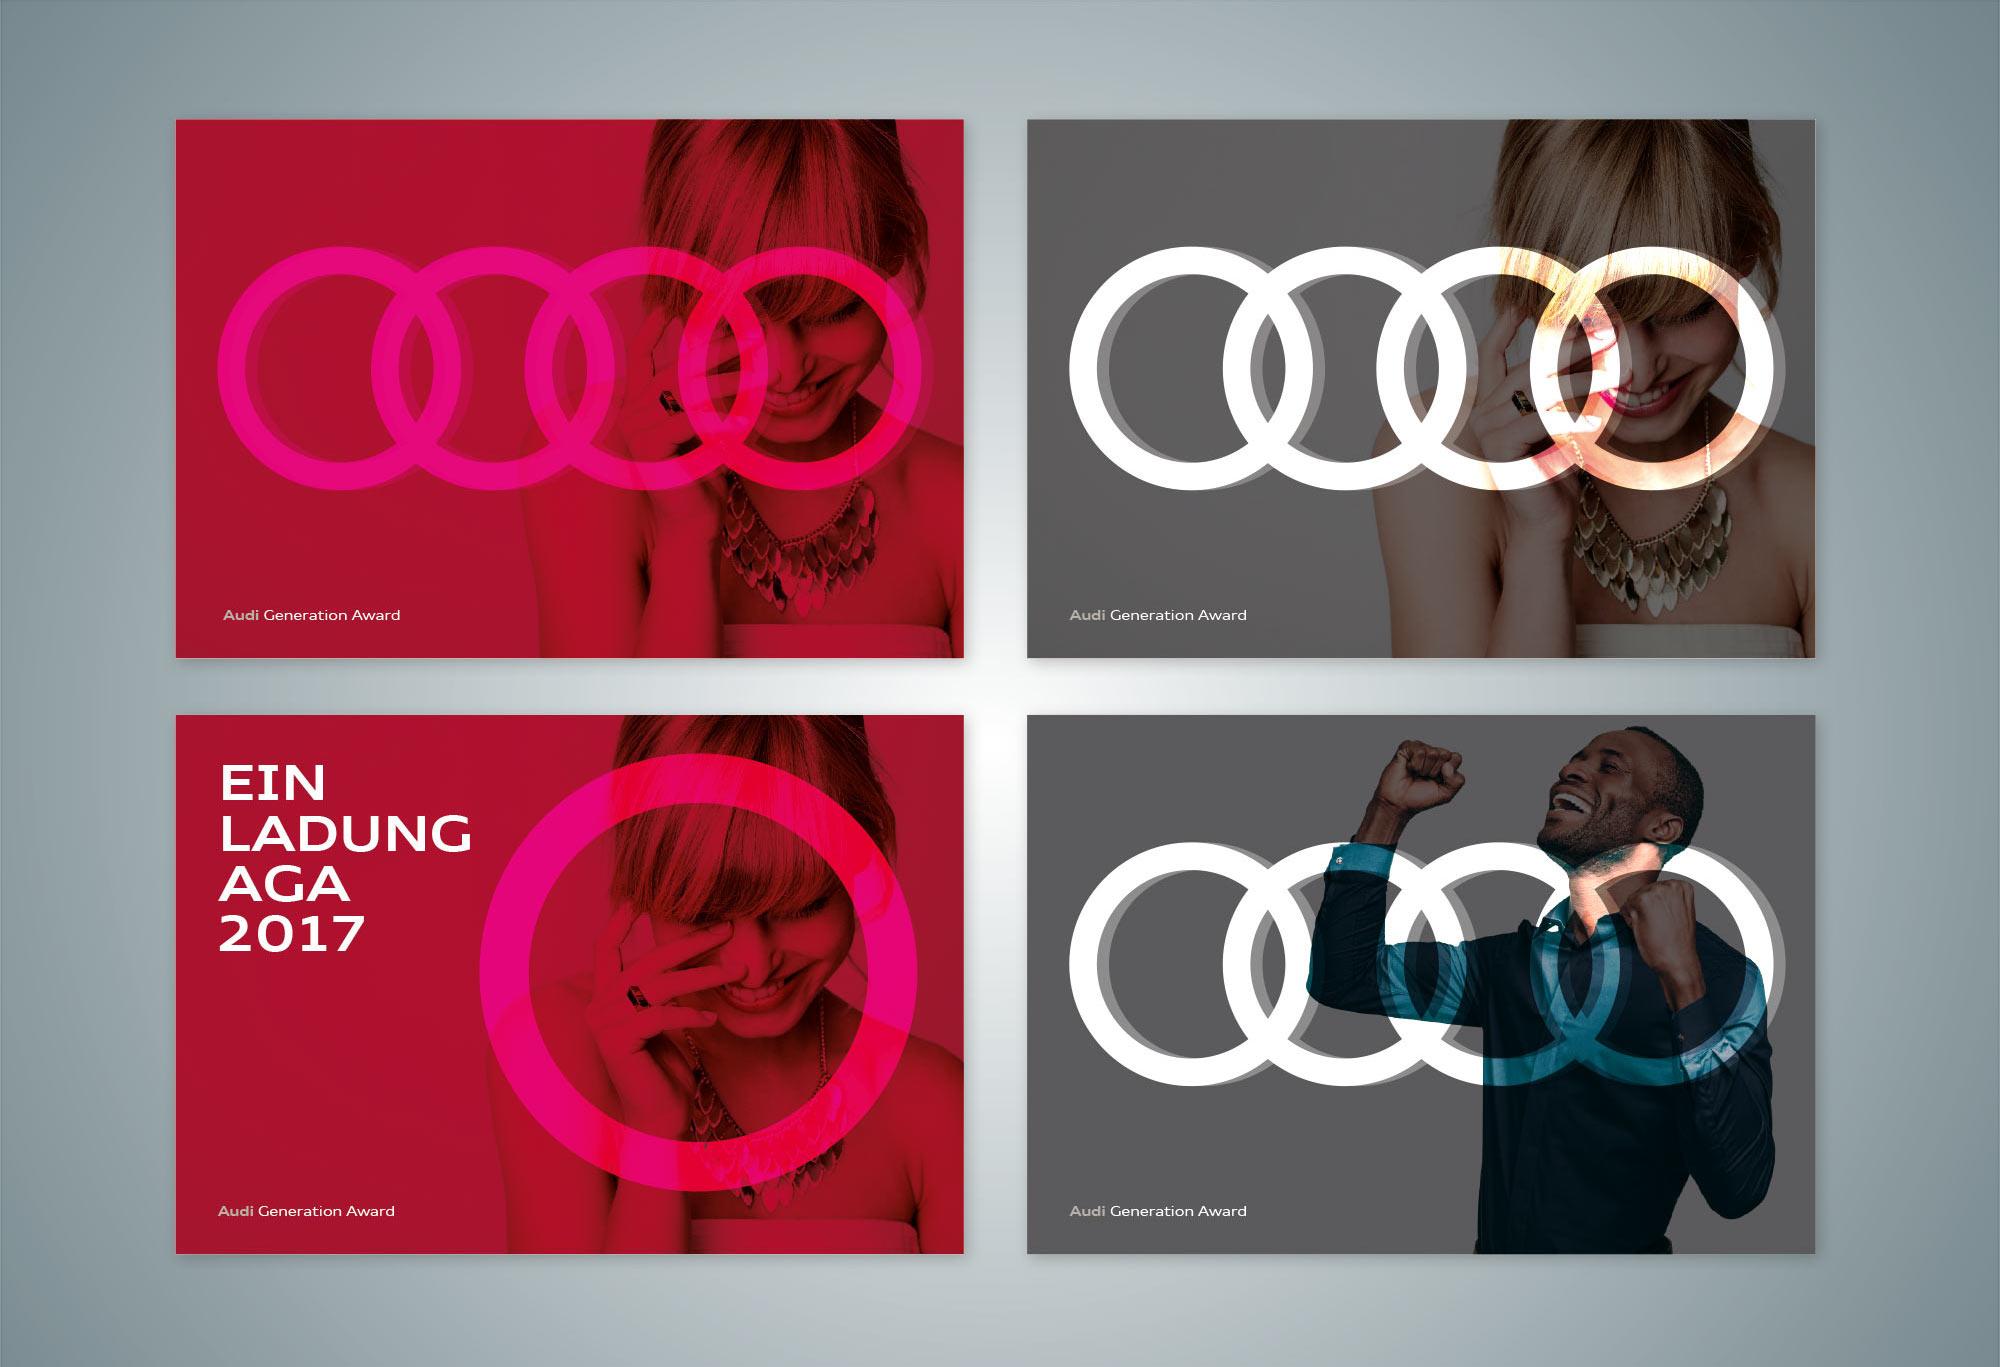 Layoutvorschlaege Redesign Audi Generation Award